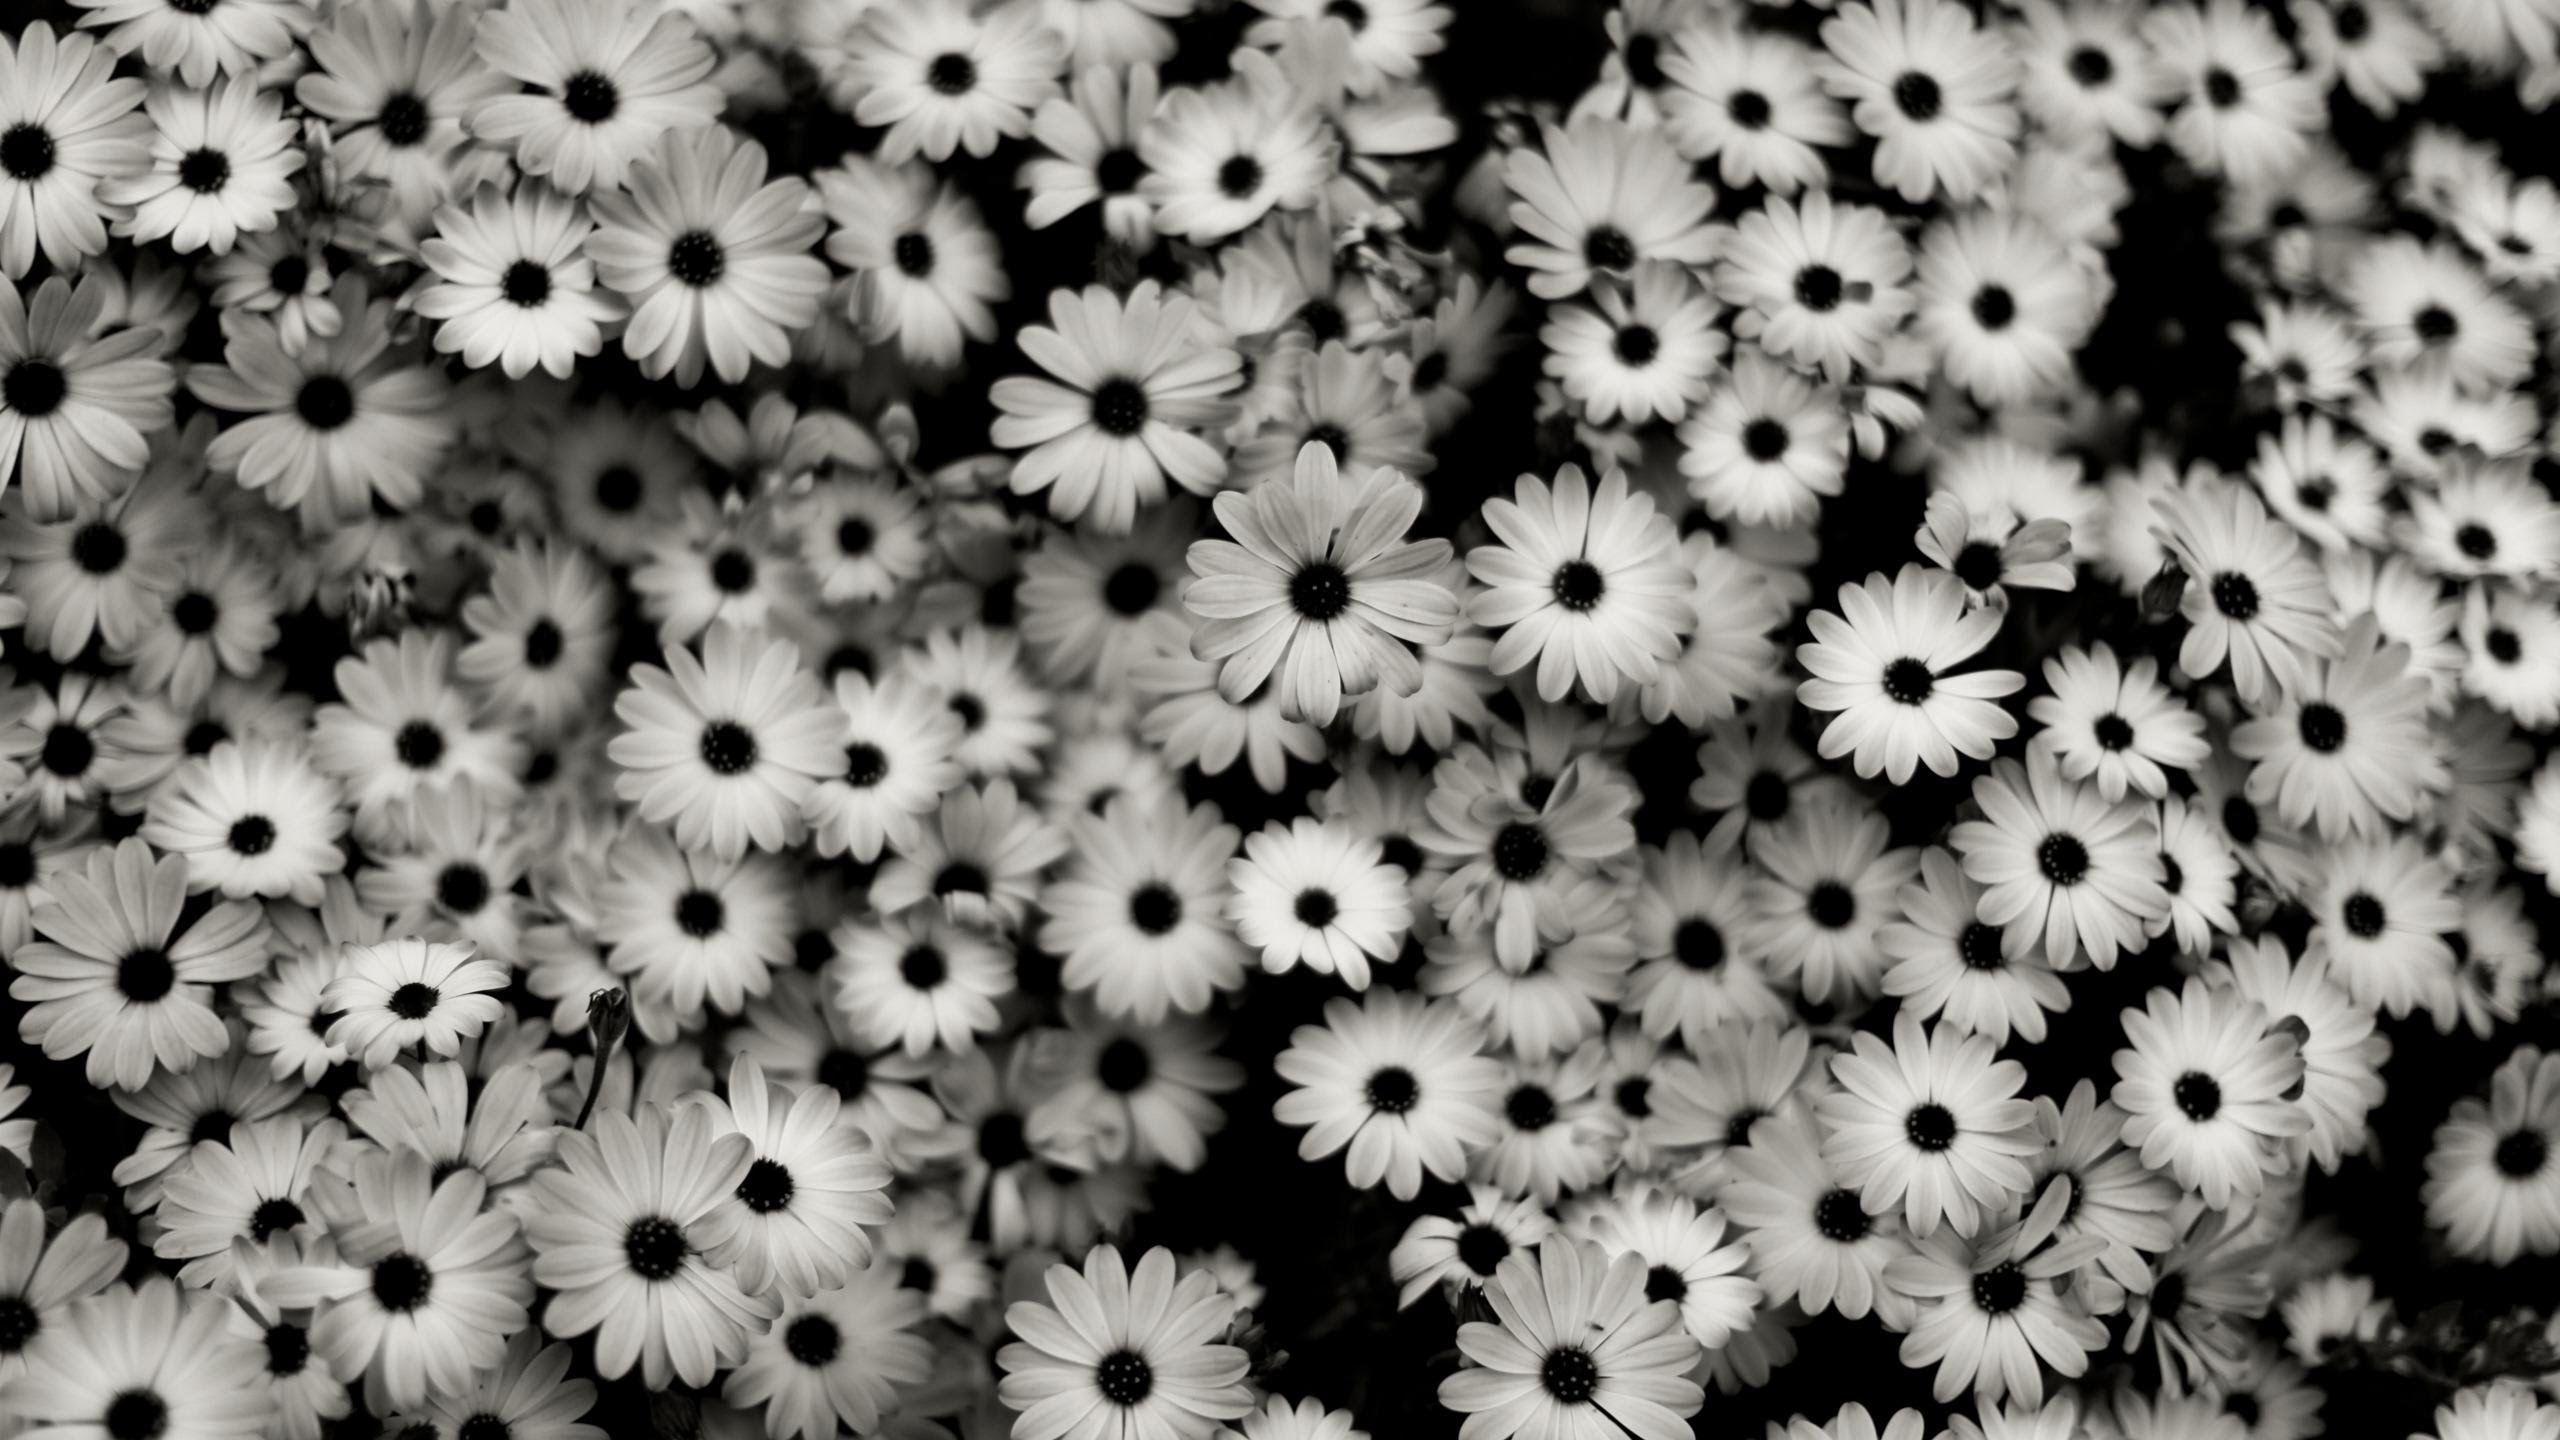 blackandwhitevintageflowerstumblr83202pixzone